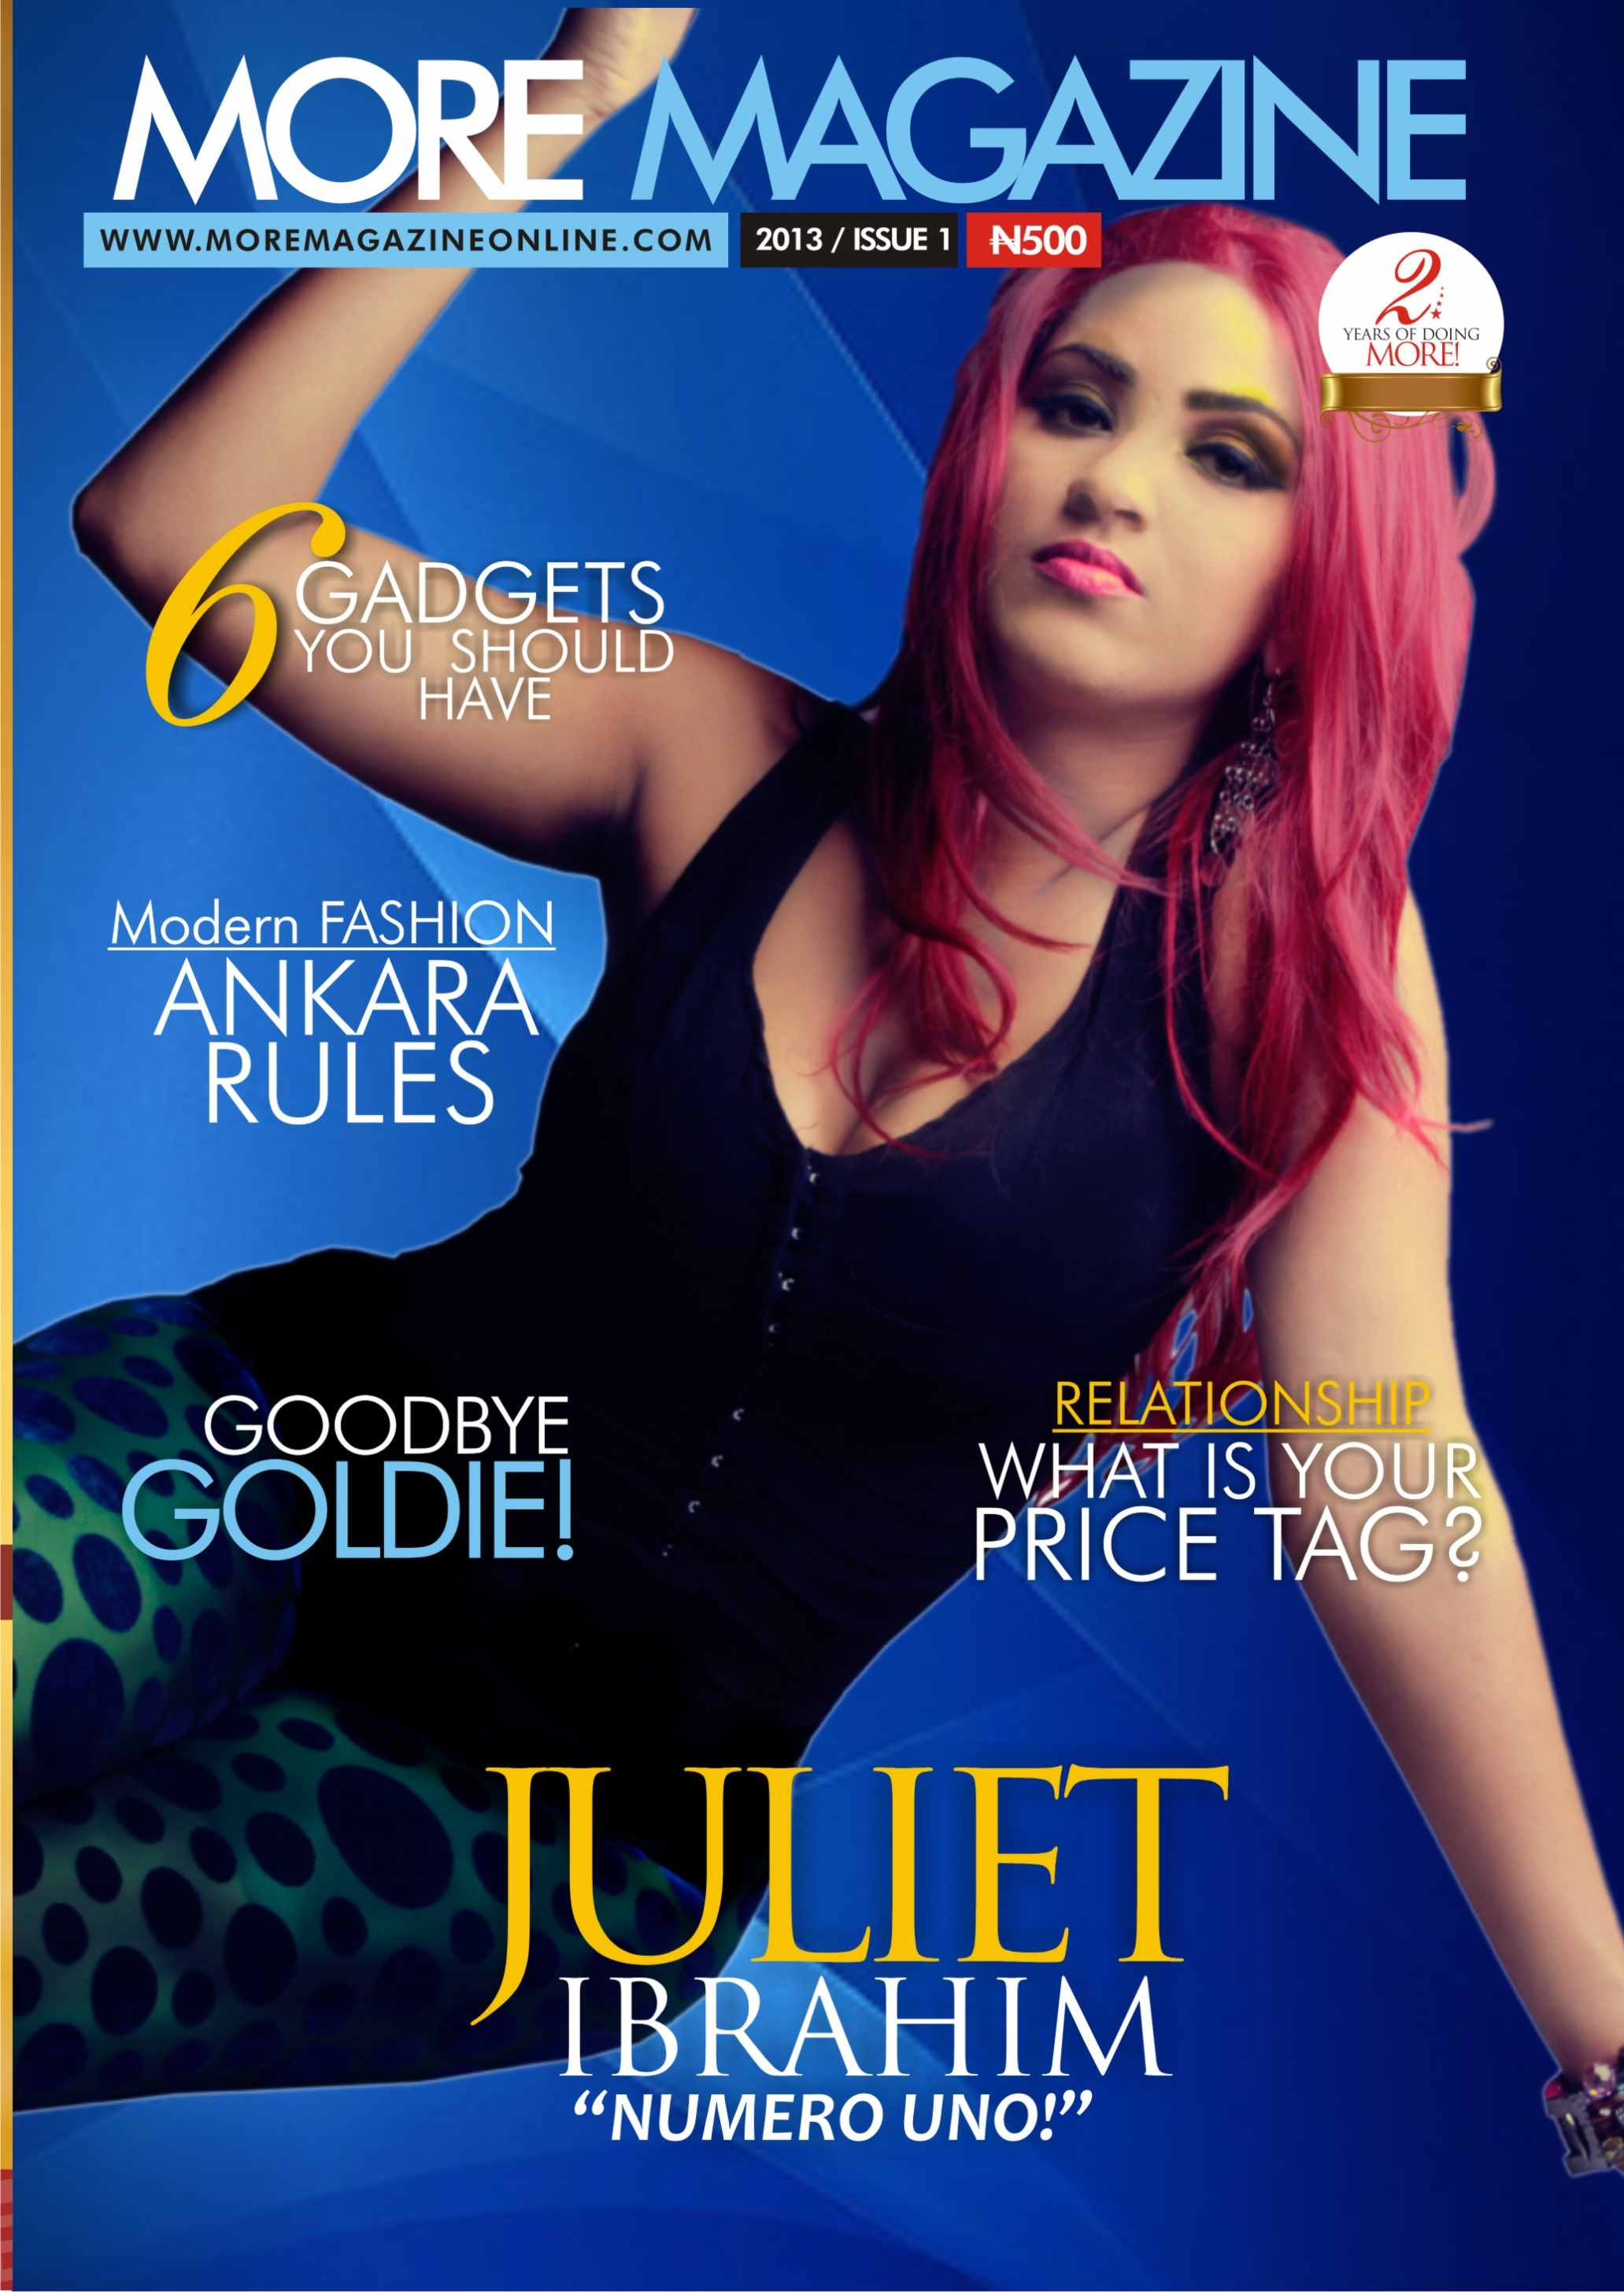 More Magazine November 2014 Issue: Ghanaian Movie Star Juliet Ibrahim Rocks Pink Hair! Check